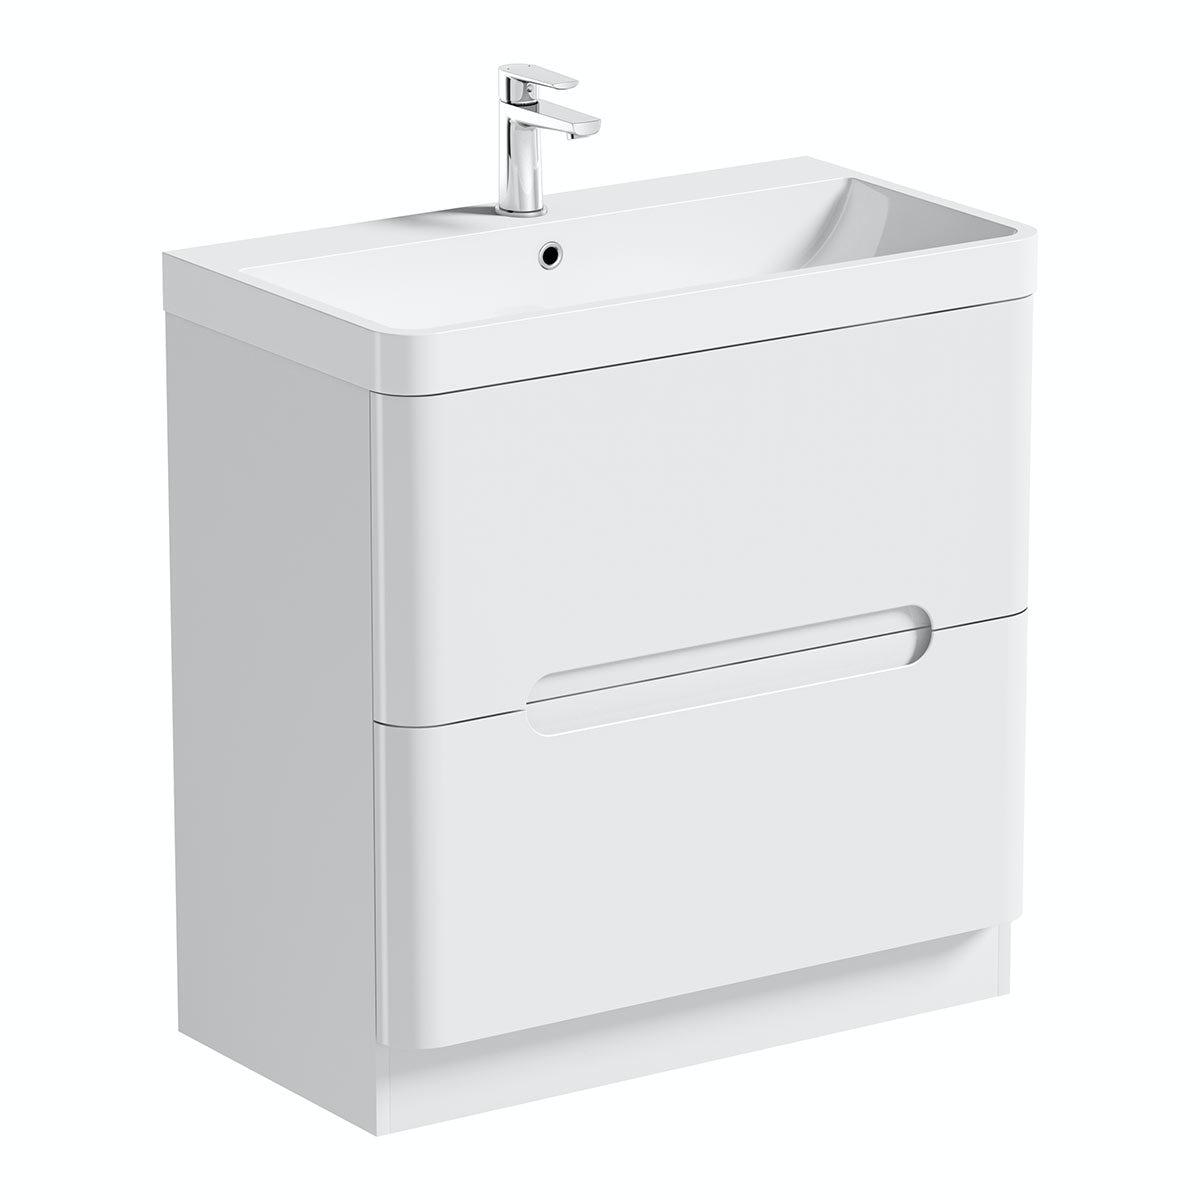 Mode Ellis white vanity drawer unit and basin 800mm